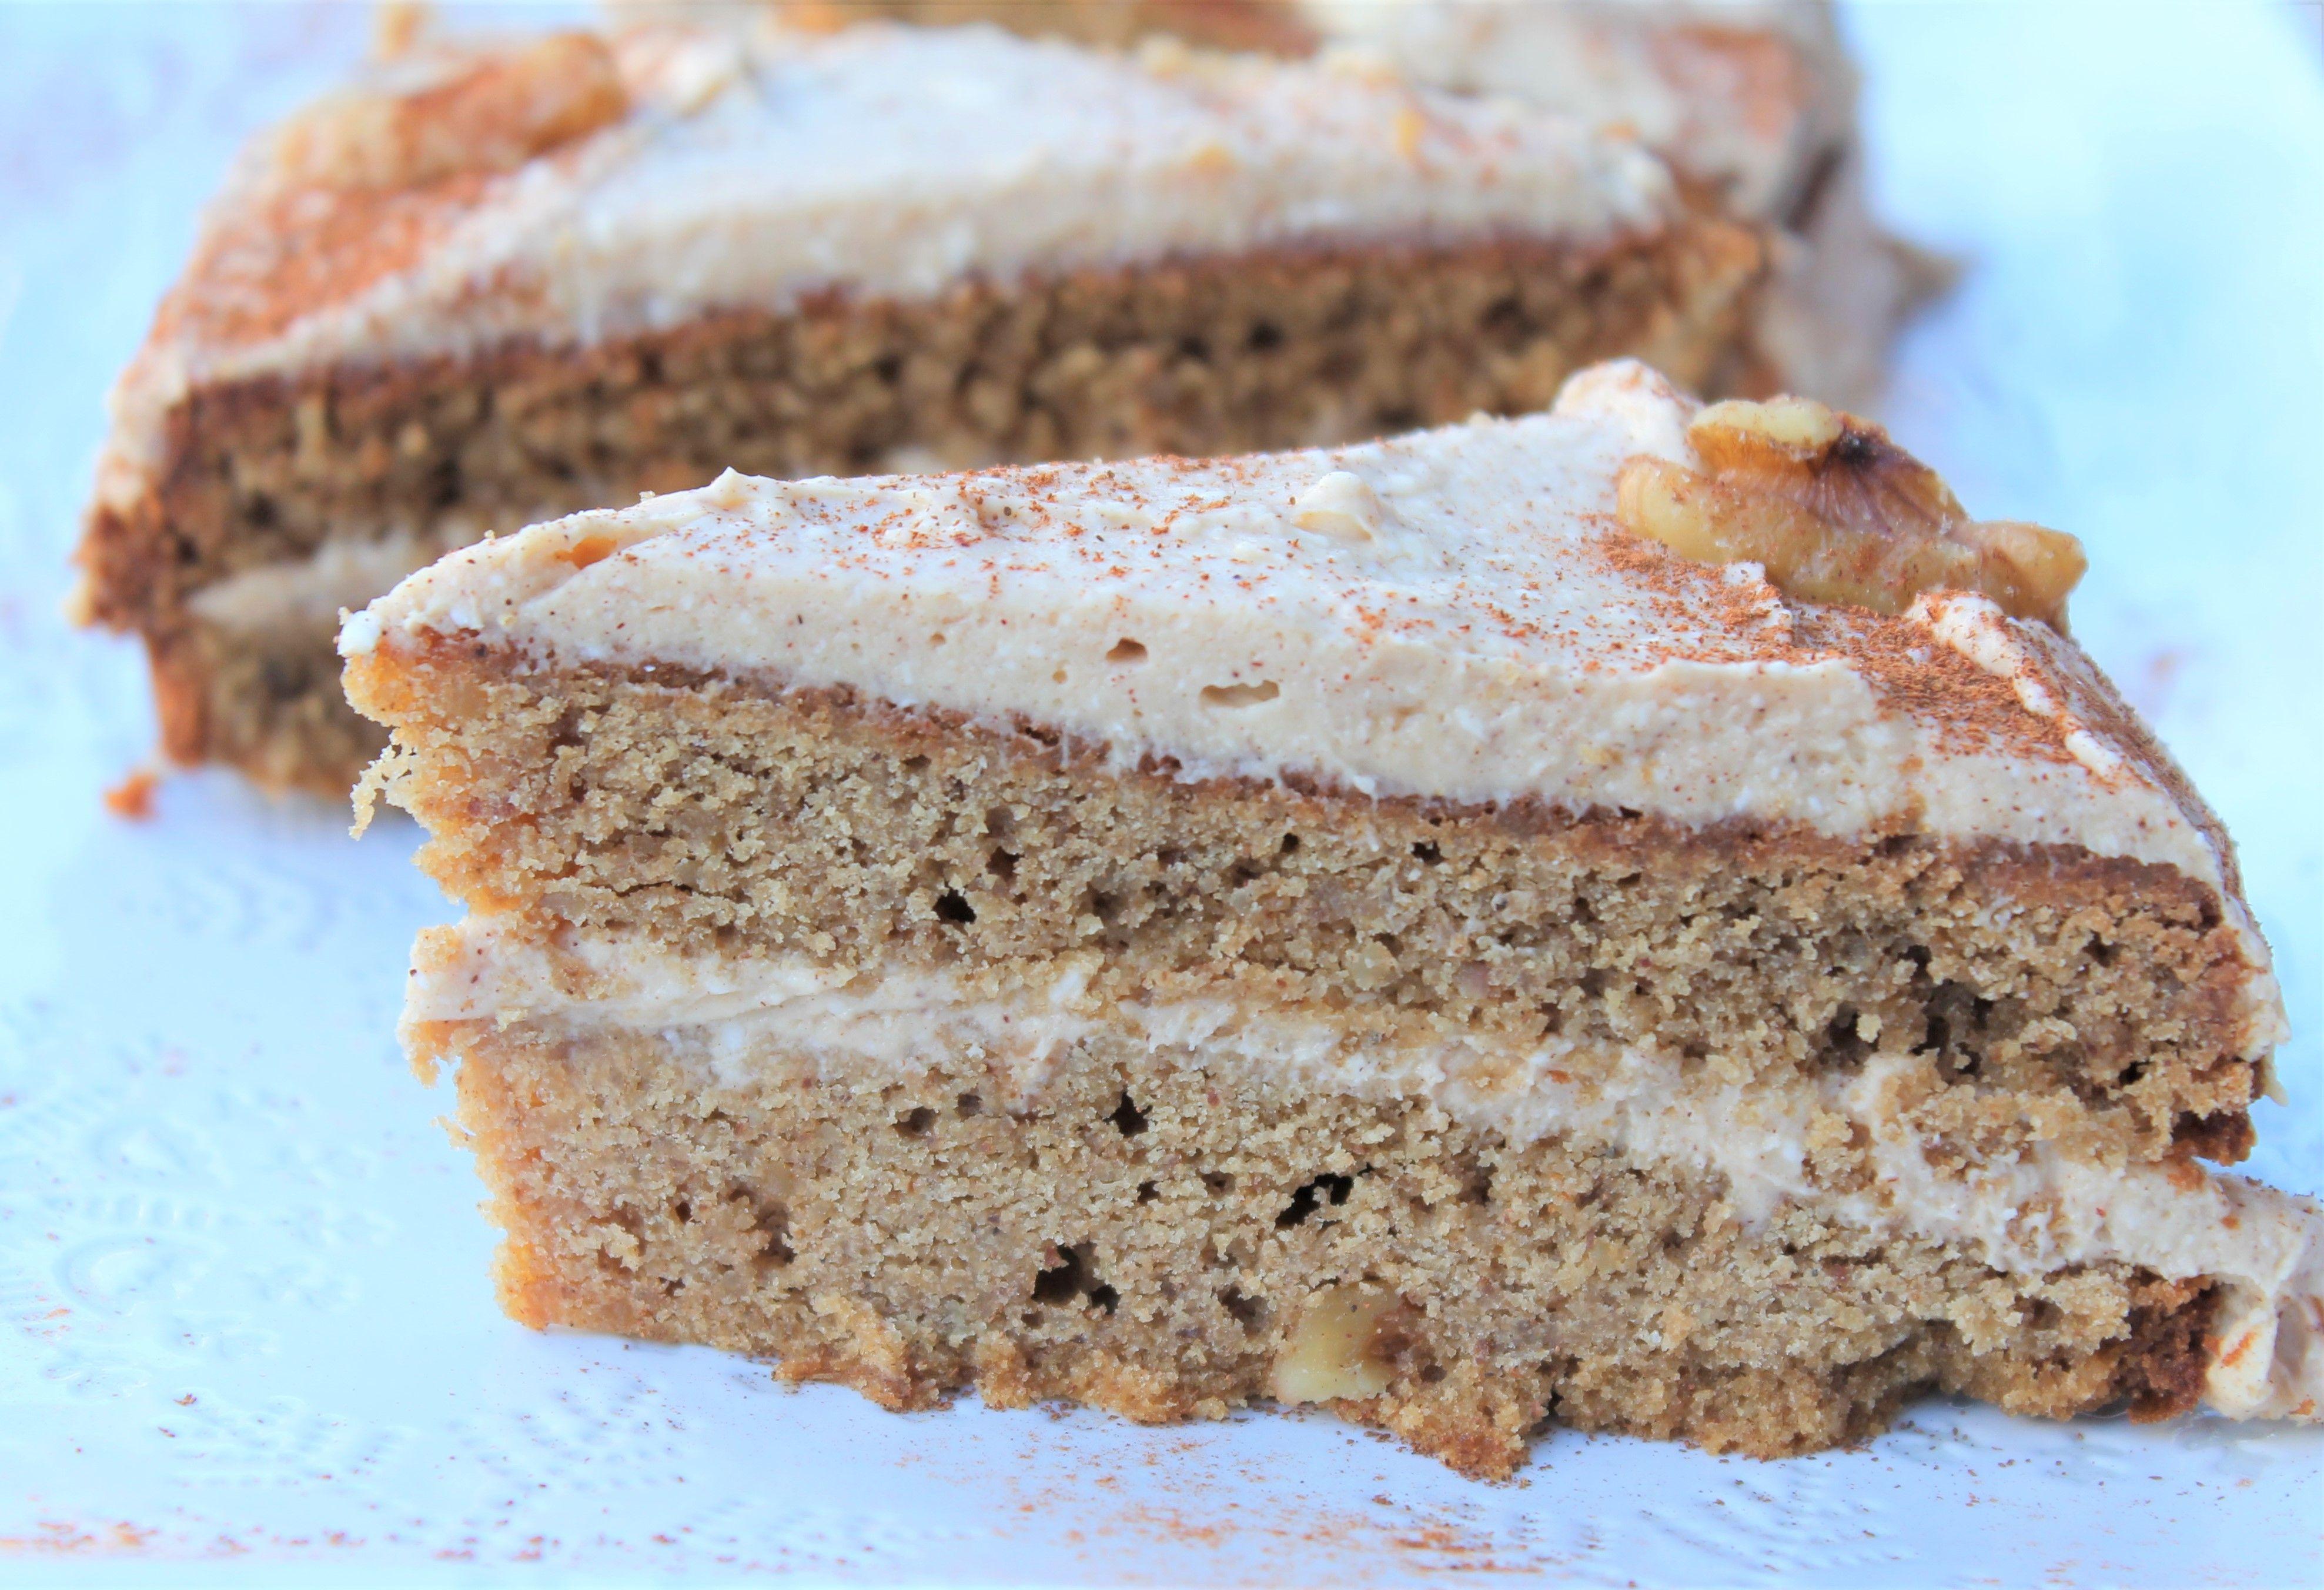 Malteser chocolate cake recipe | Recipe | Chocolate cake